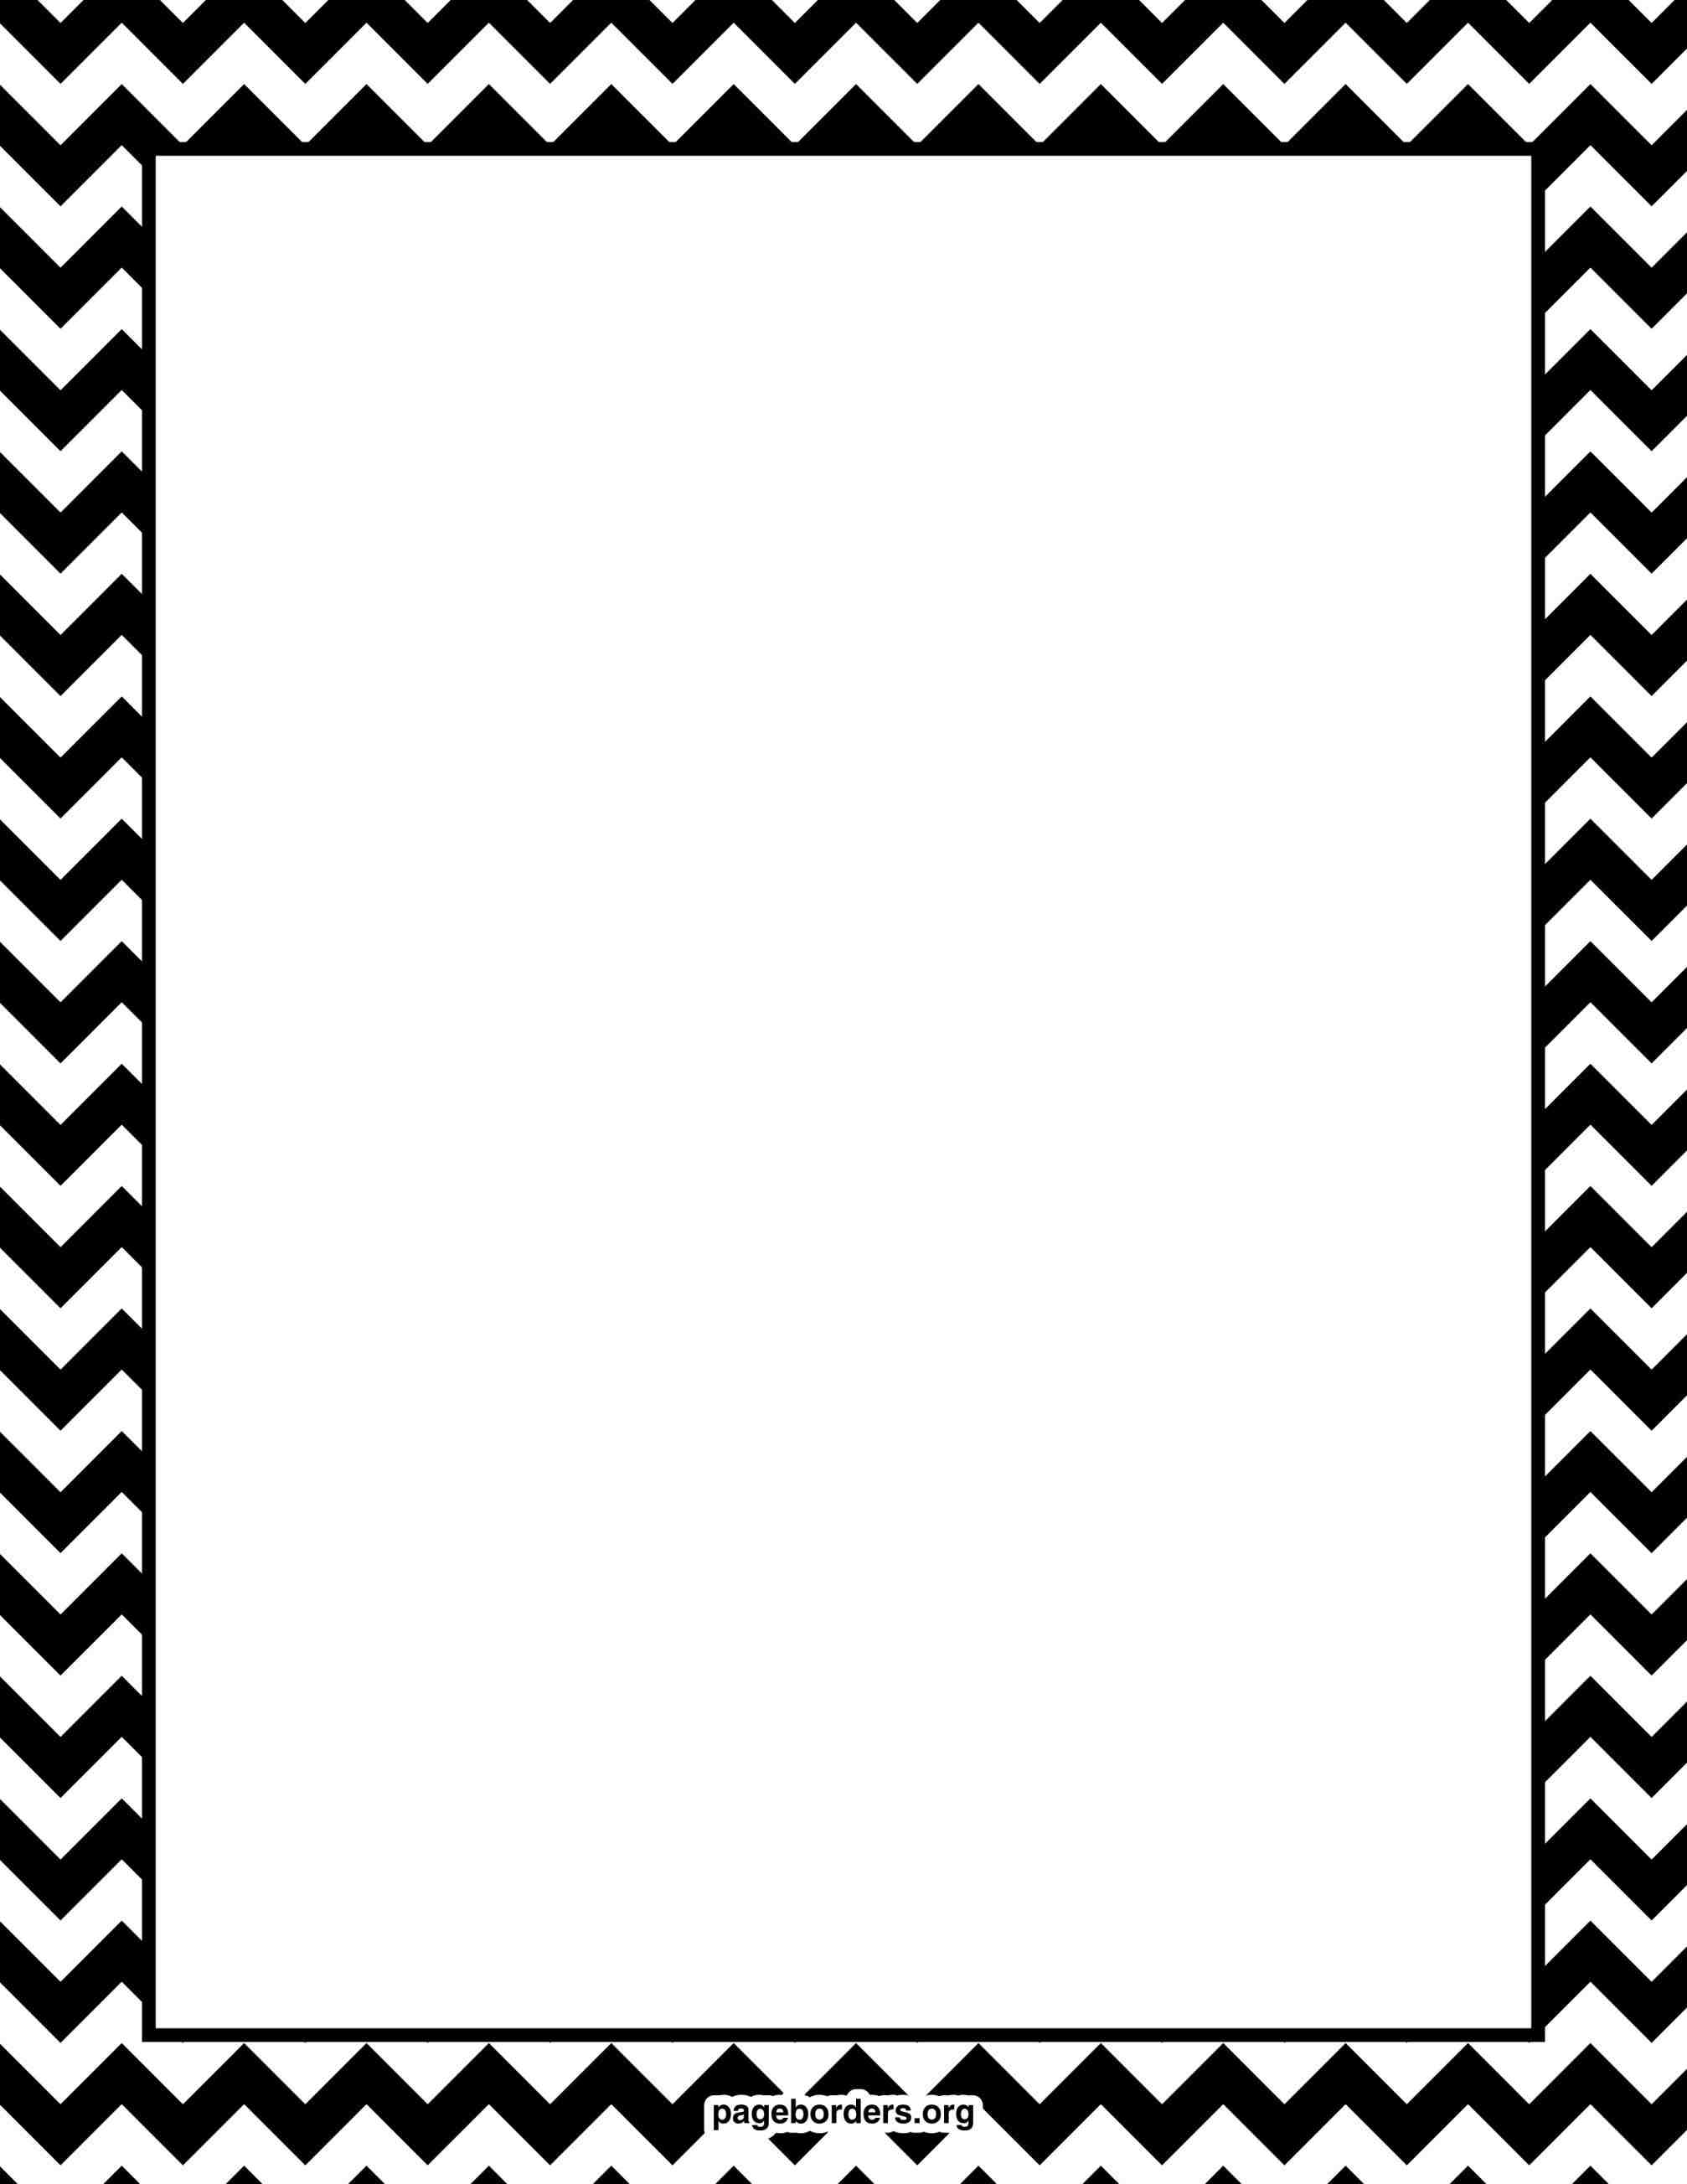 2014x2607 Christmas Border Clip Art Black And White Cheminee.website